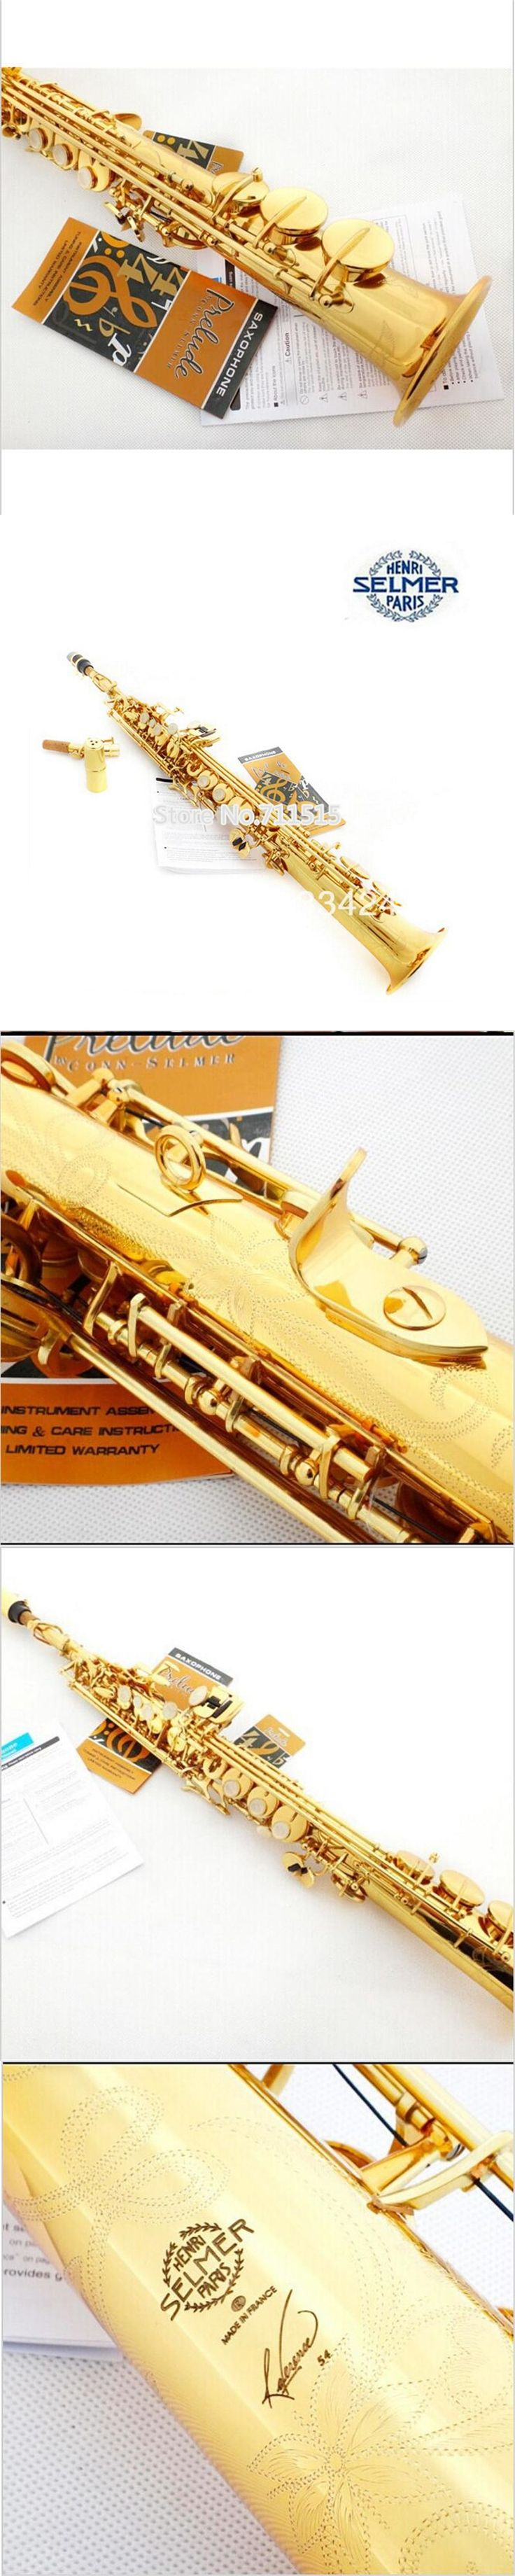 SSS-54 Brand Selmer Saxophone Soprano Sax Selmer B(B) Gold Lacquer Brass Carve Pattern Soprano Saxofone